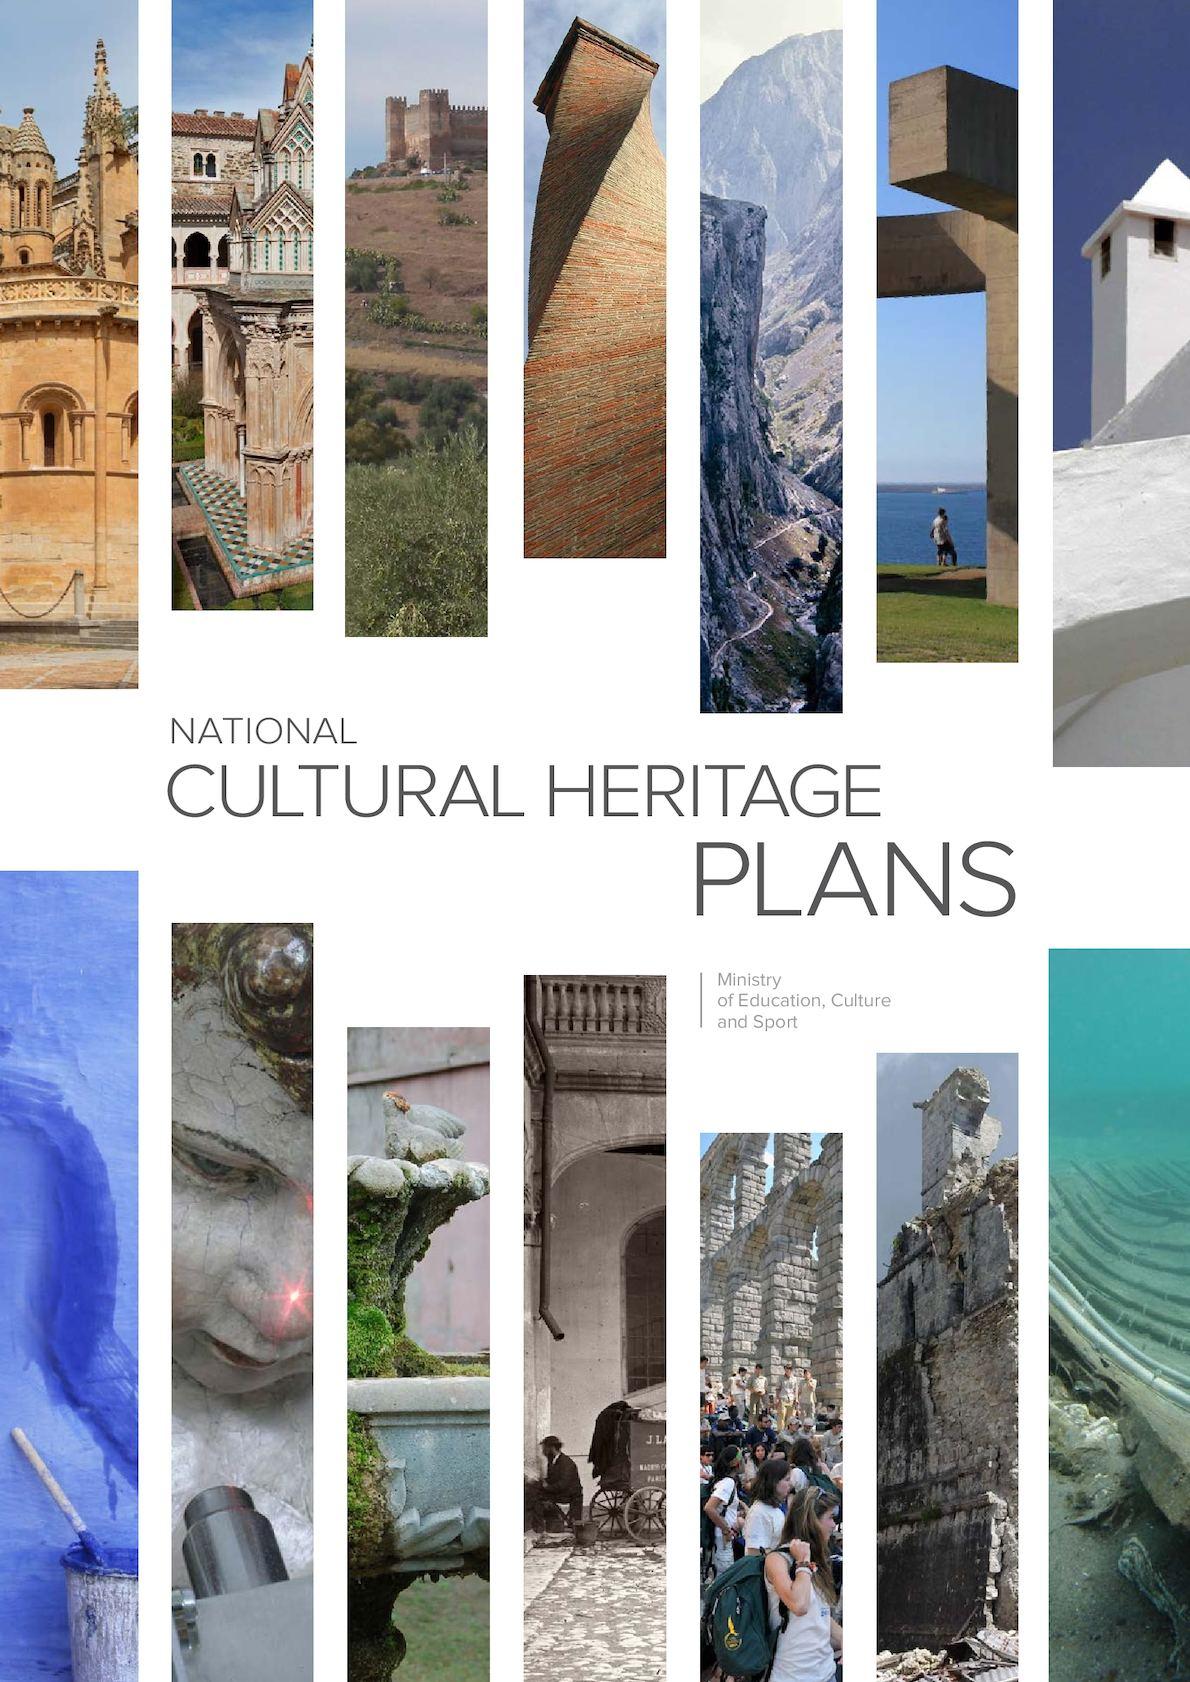 Portaceli Banos.Calameo National Cultural Heritage Plans